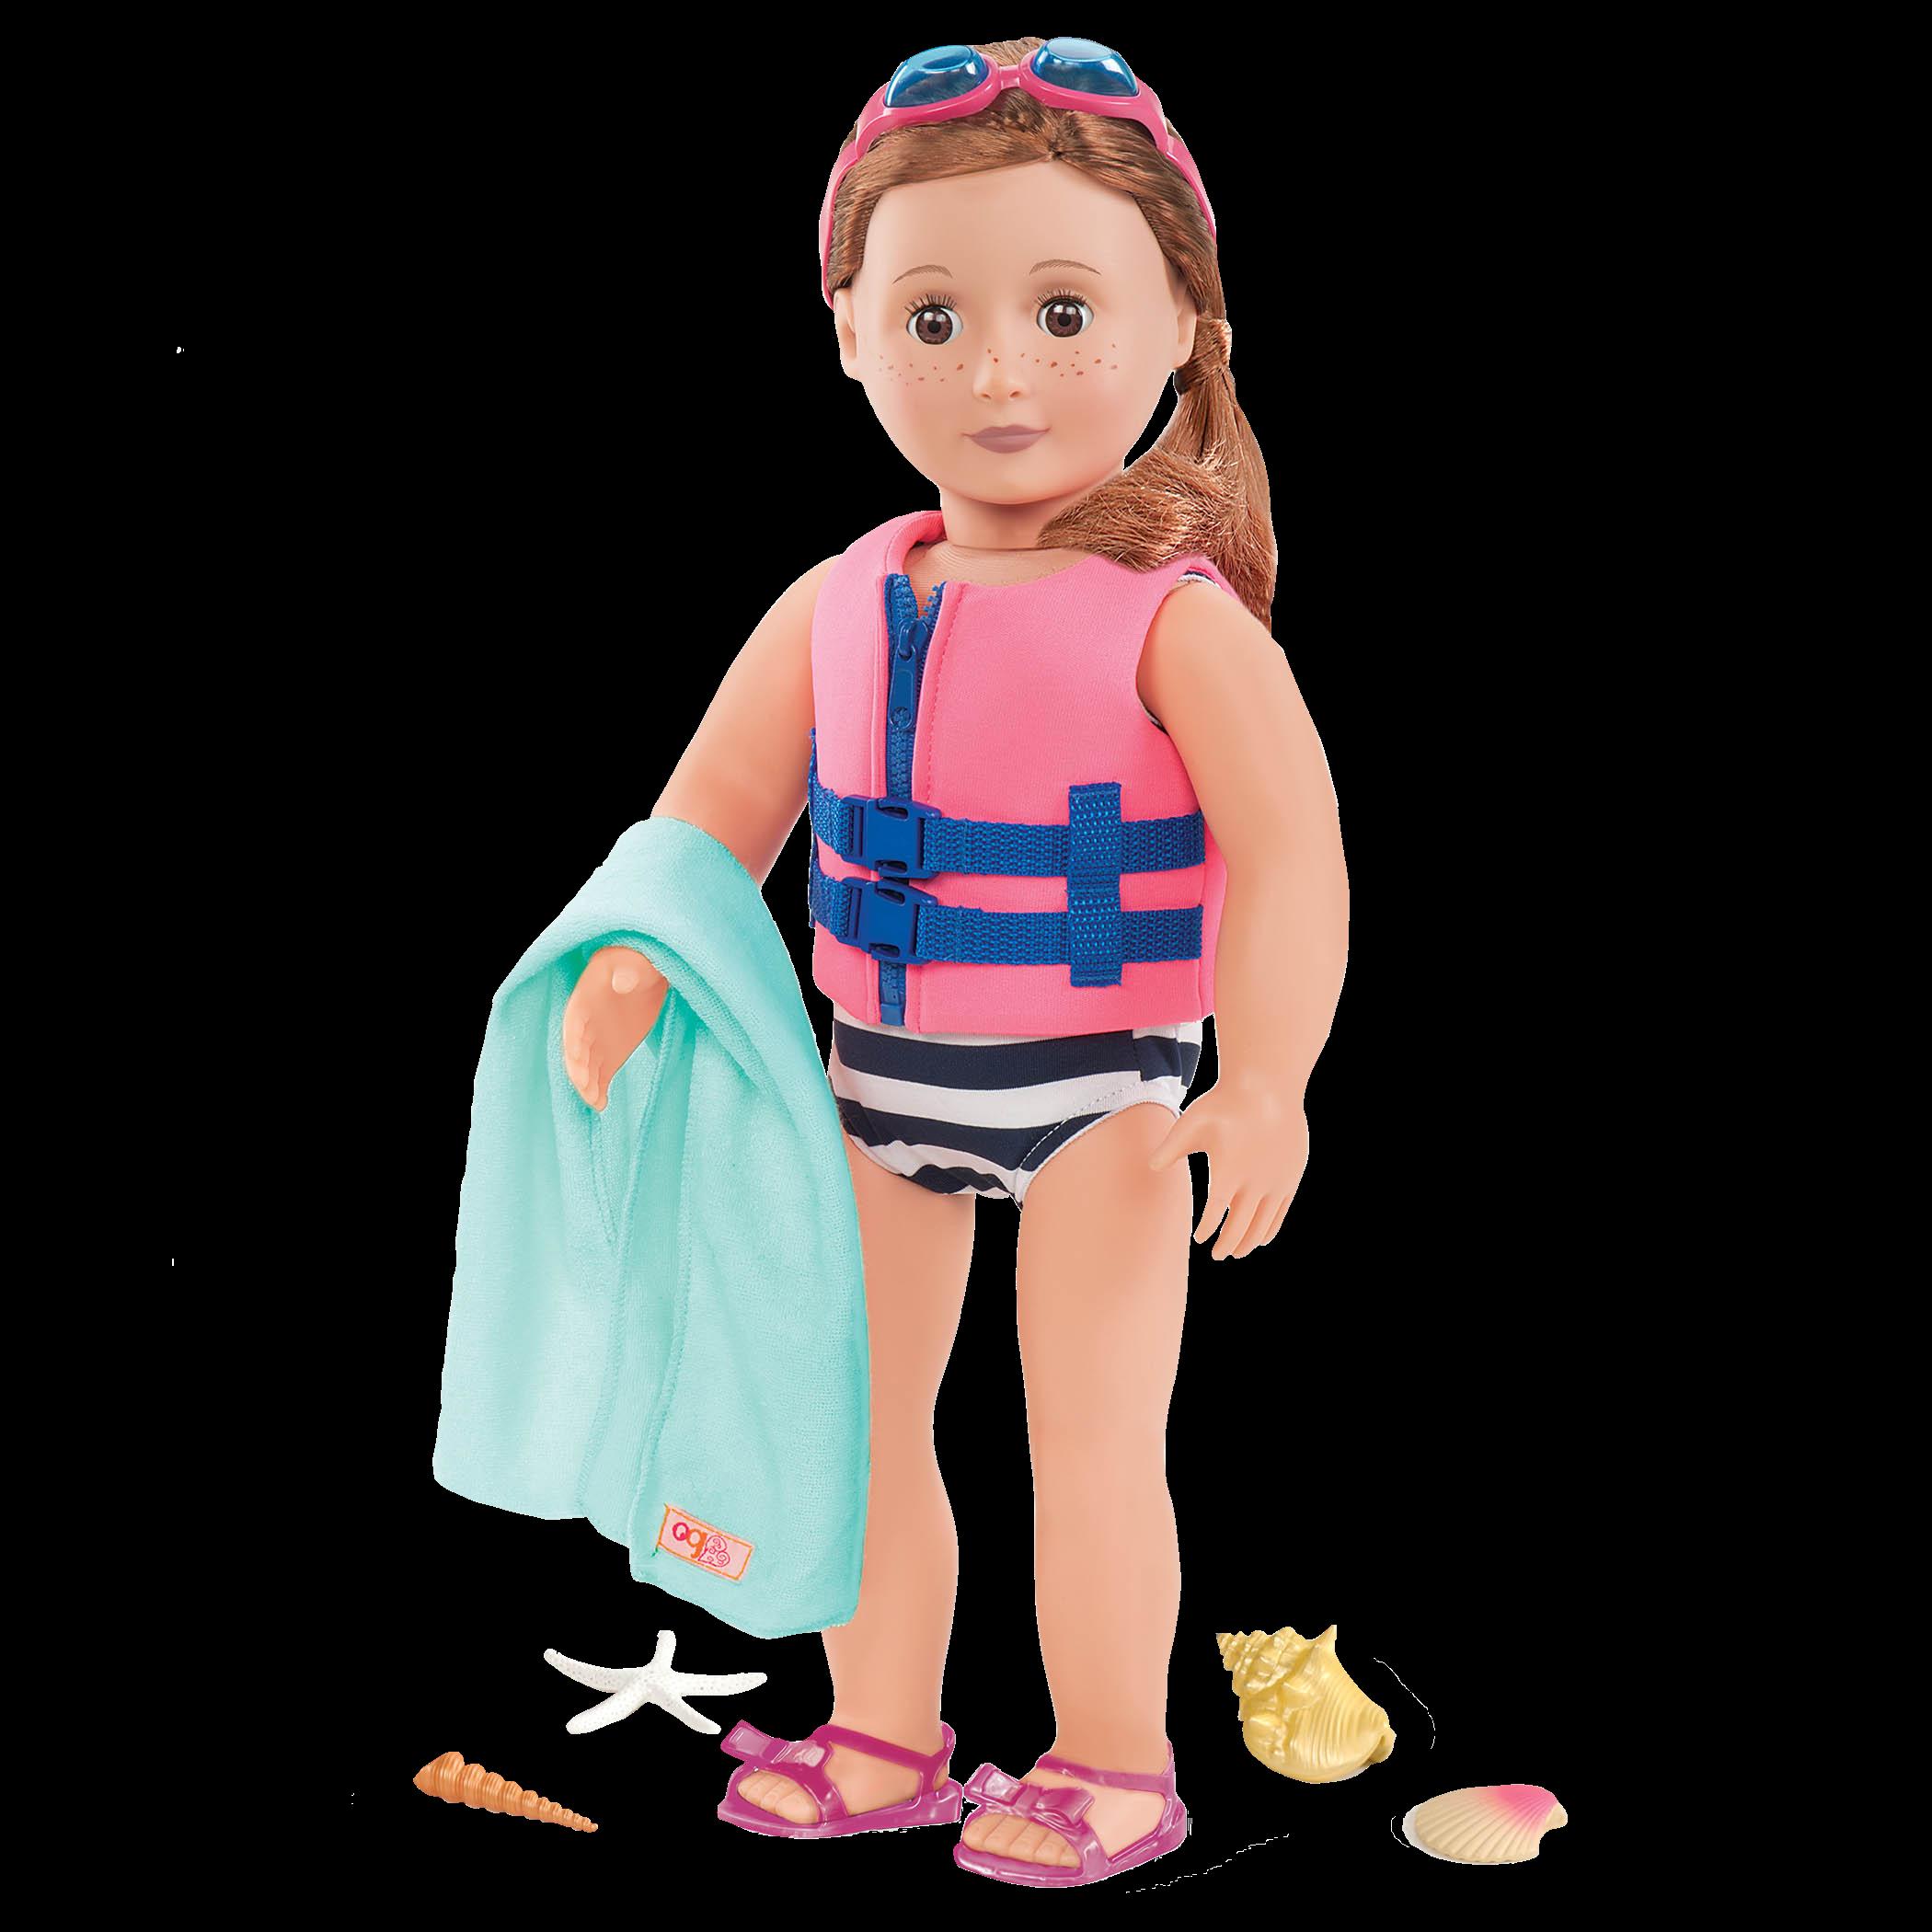 Eva wearing Fun Day Sun Day Beach Outfit